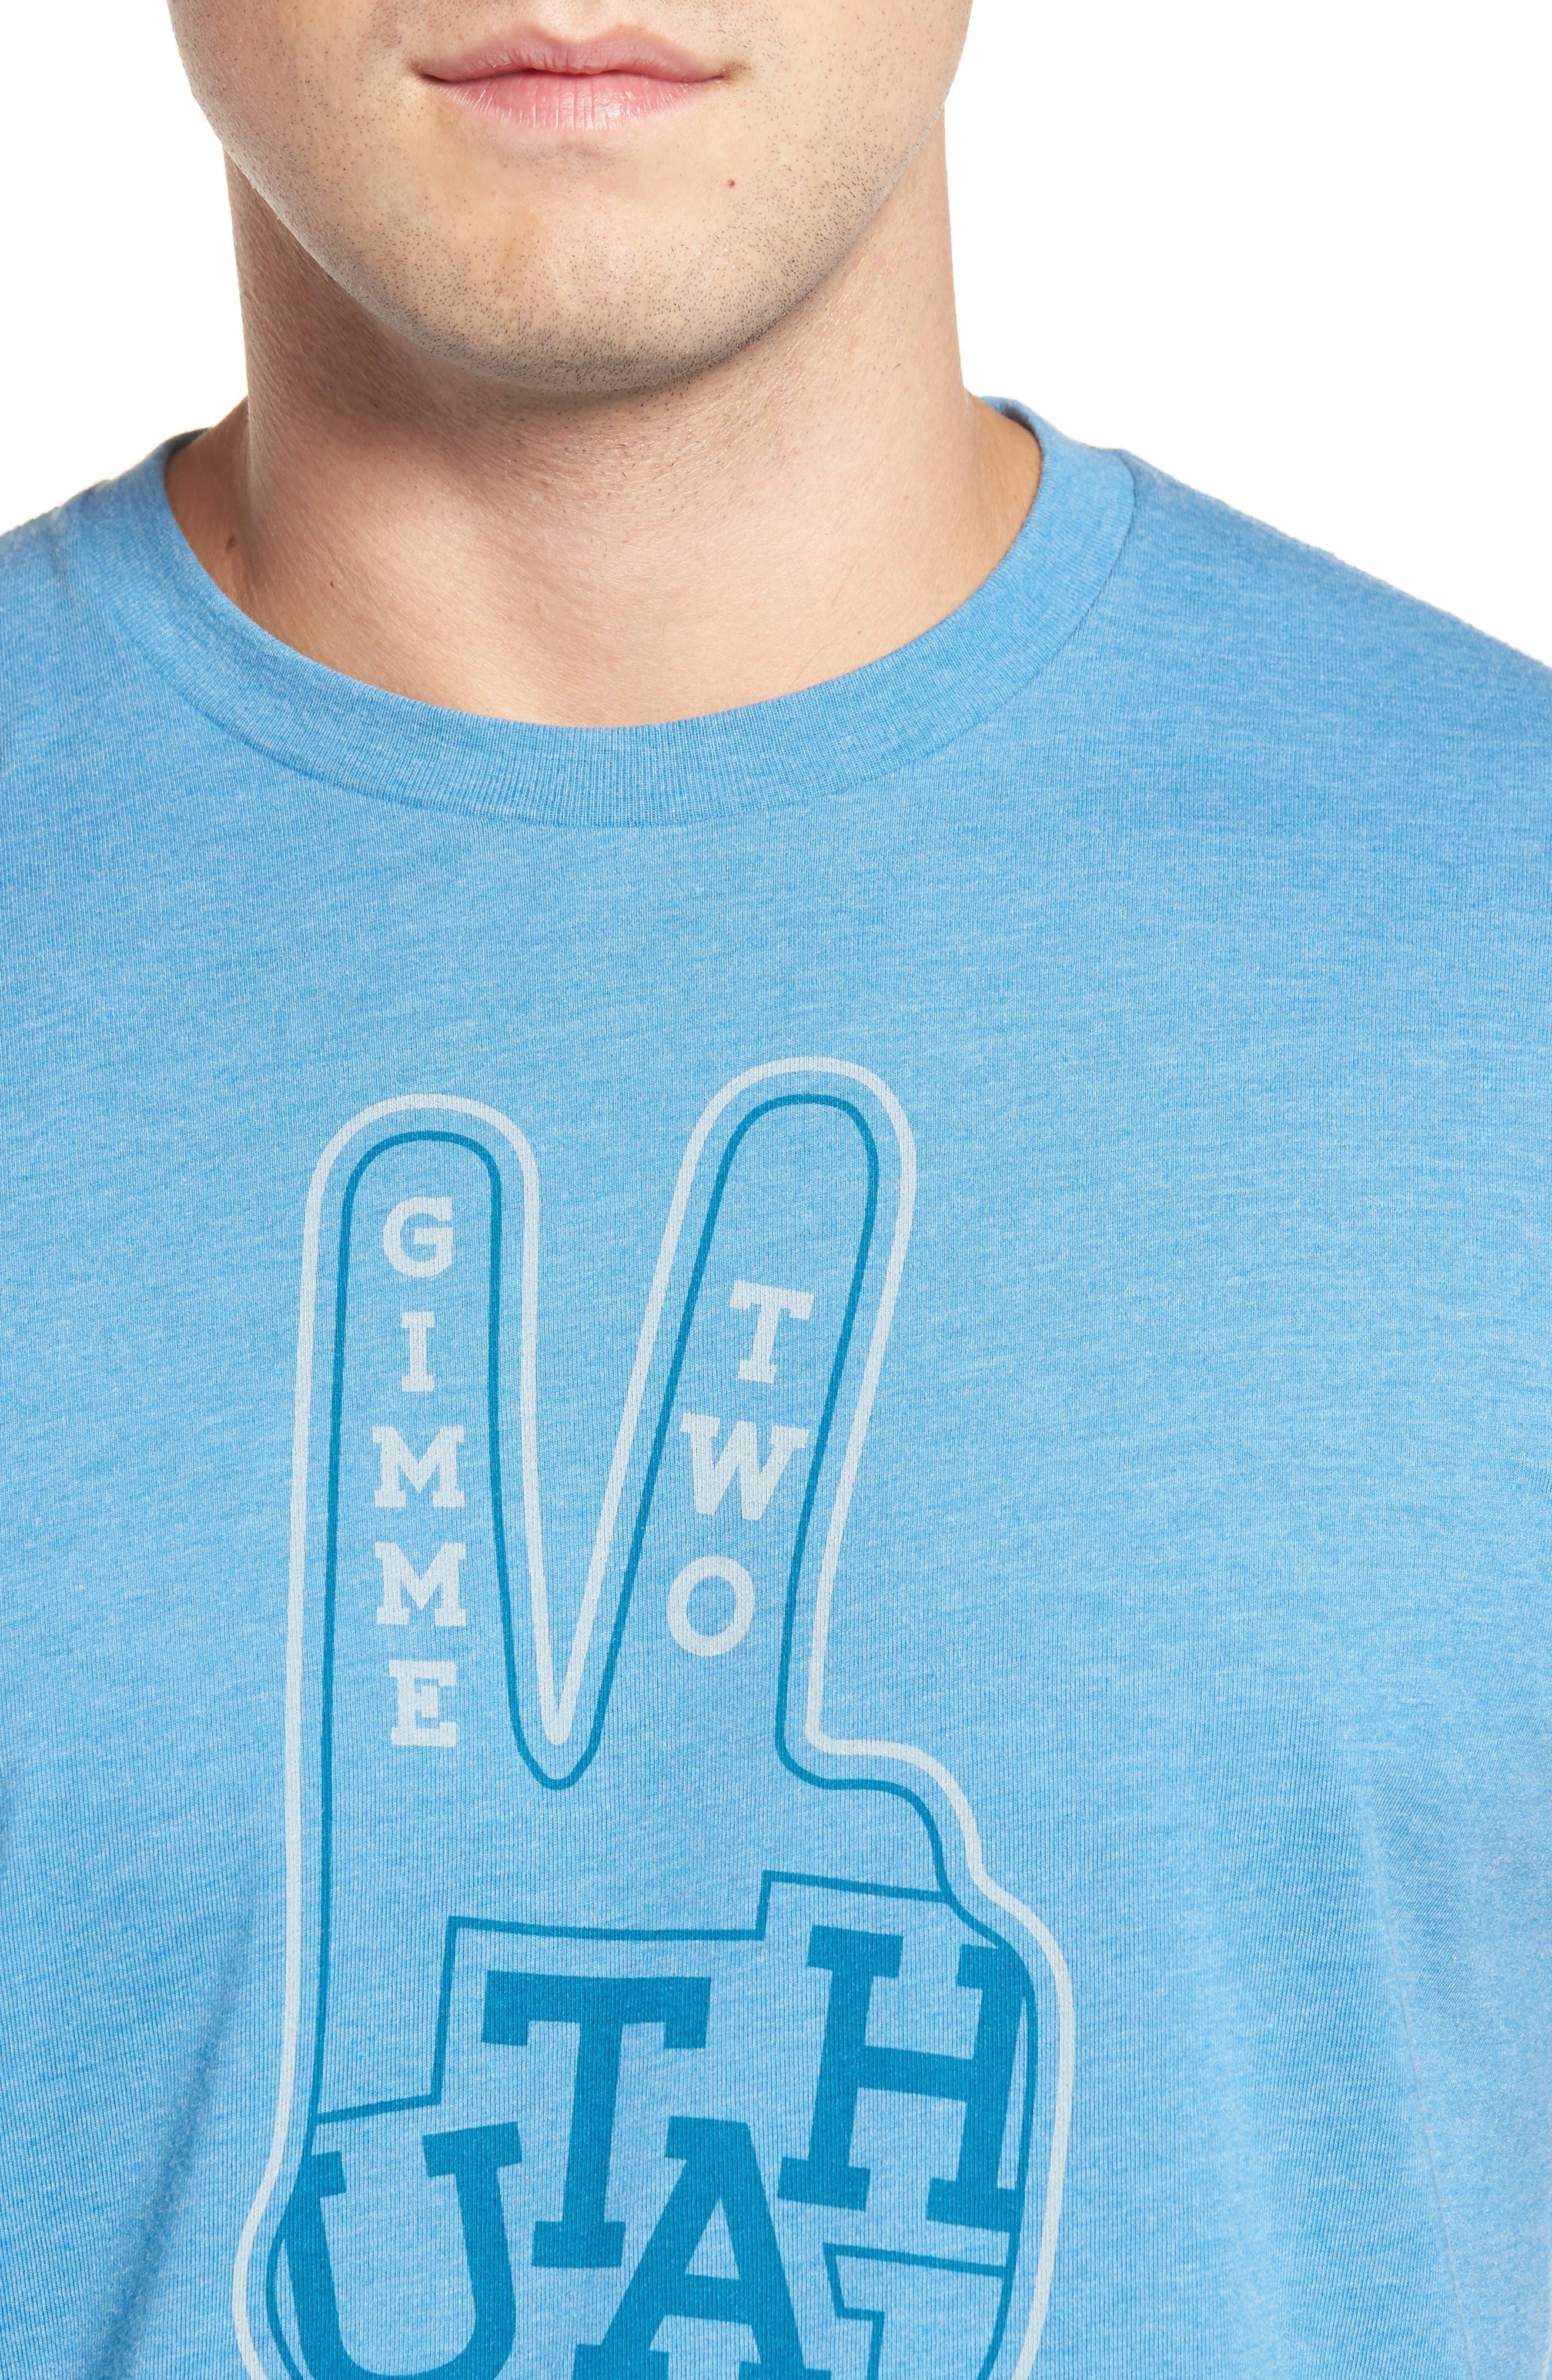 Utah T-Shirt,                             Alternate thumbnail 4, color,                             400